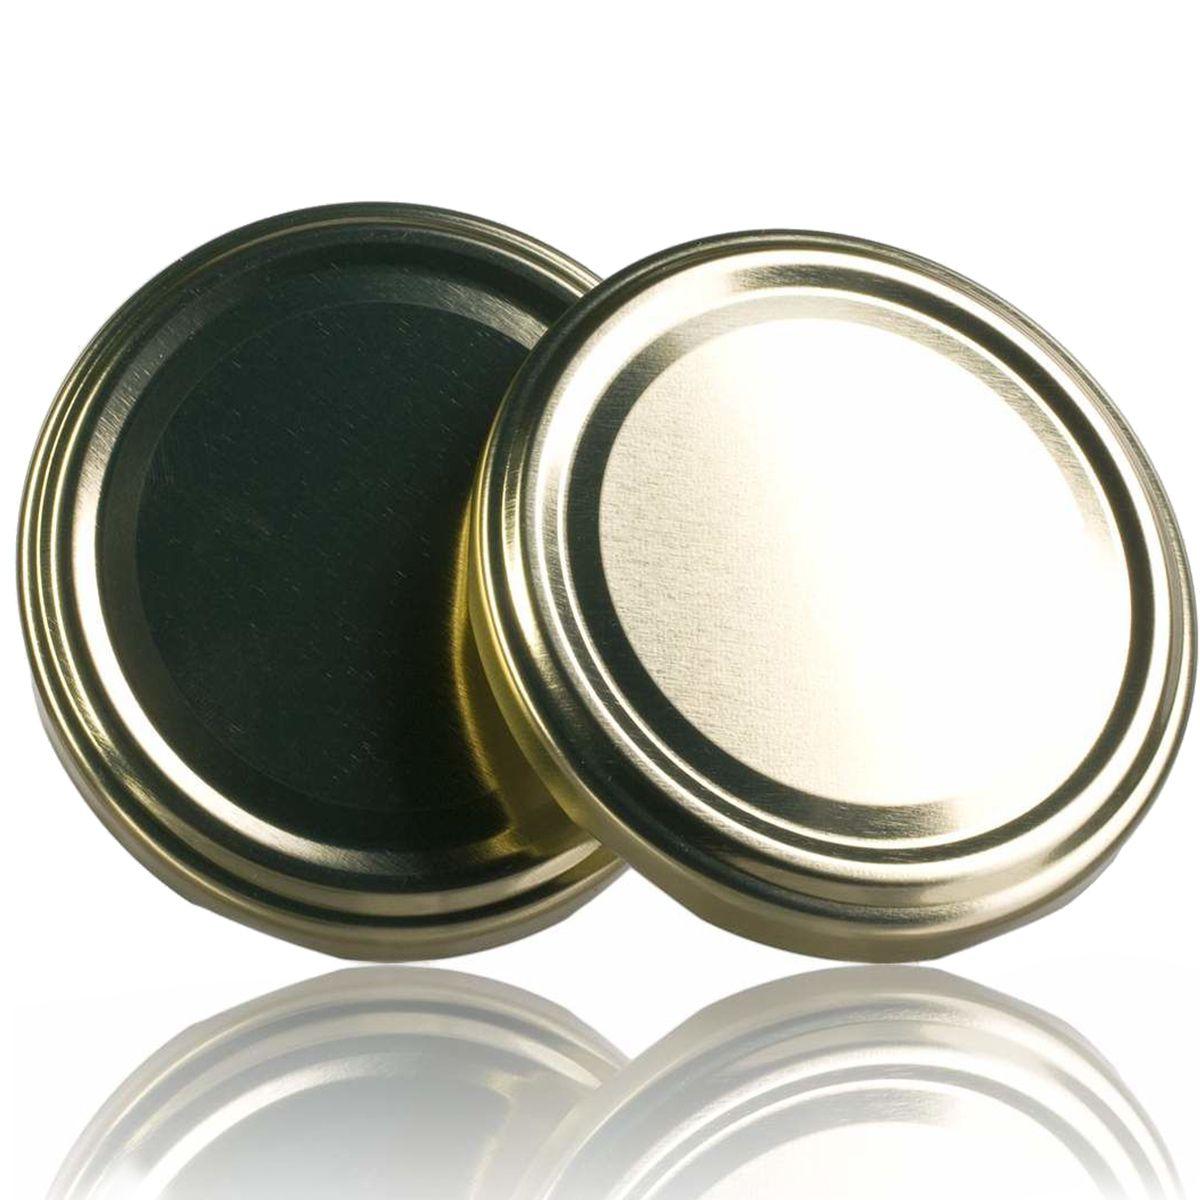 96 Potes De Vidro Mini Belém 150 Ml Tampa Dourada + Lacre  - EMPÓRIO PACK